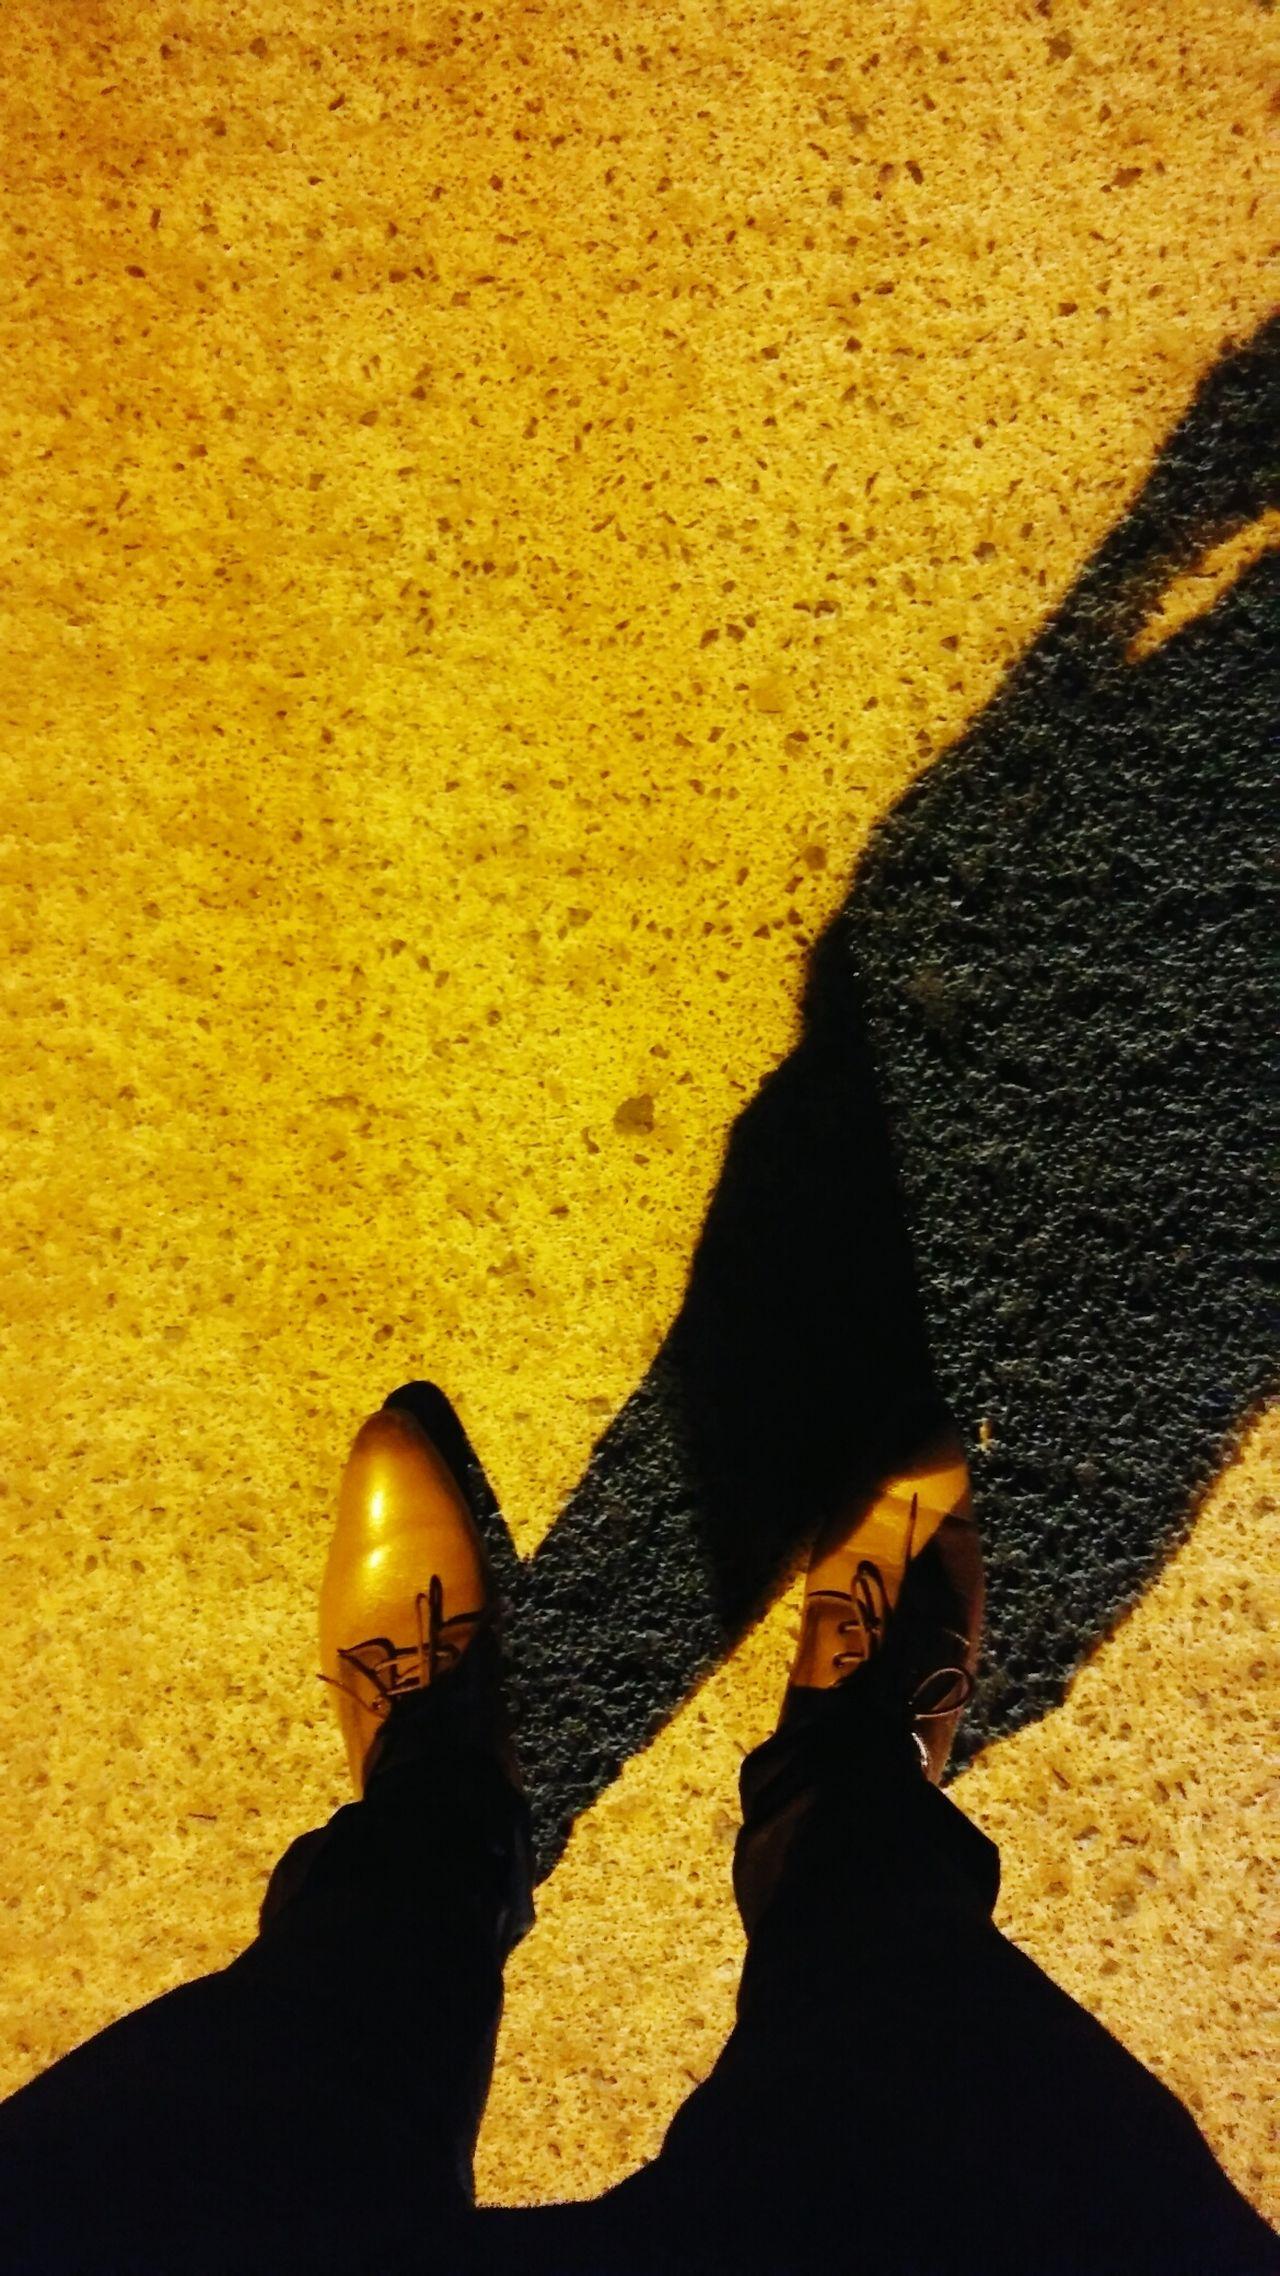 Shadows & Lights Roadscenes Shoes Selfphotography Nightphotography Night Lights Shoes ♥ Shoeselfie Yellowlights EyEmNewHere